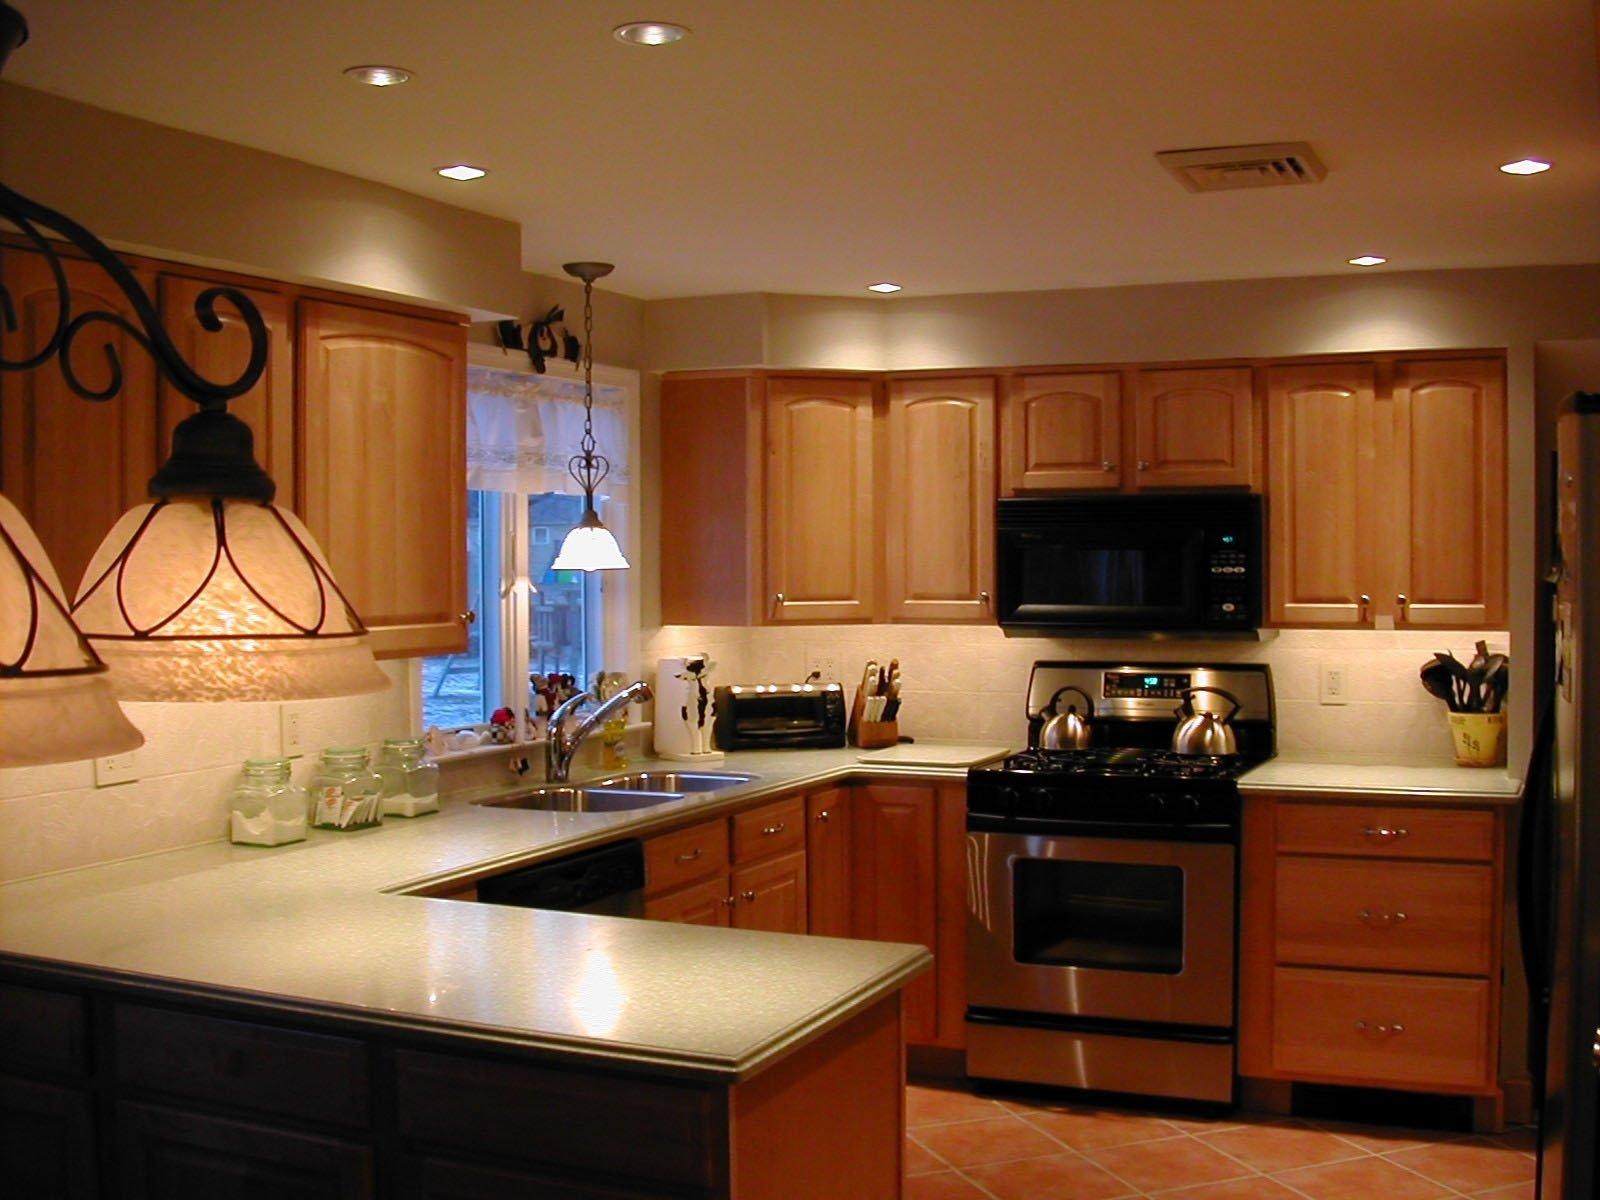 10 Unique Kitchen Lighting Ideas Small Kitchen kitchen lighting ideas small light in pictures if kitchens cabinet